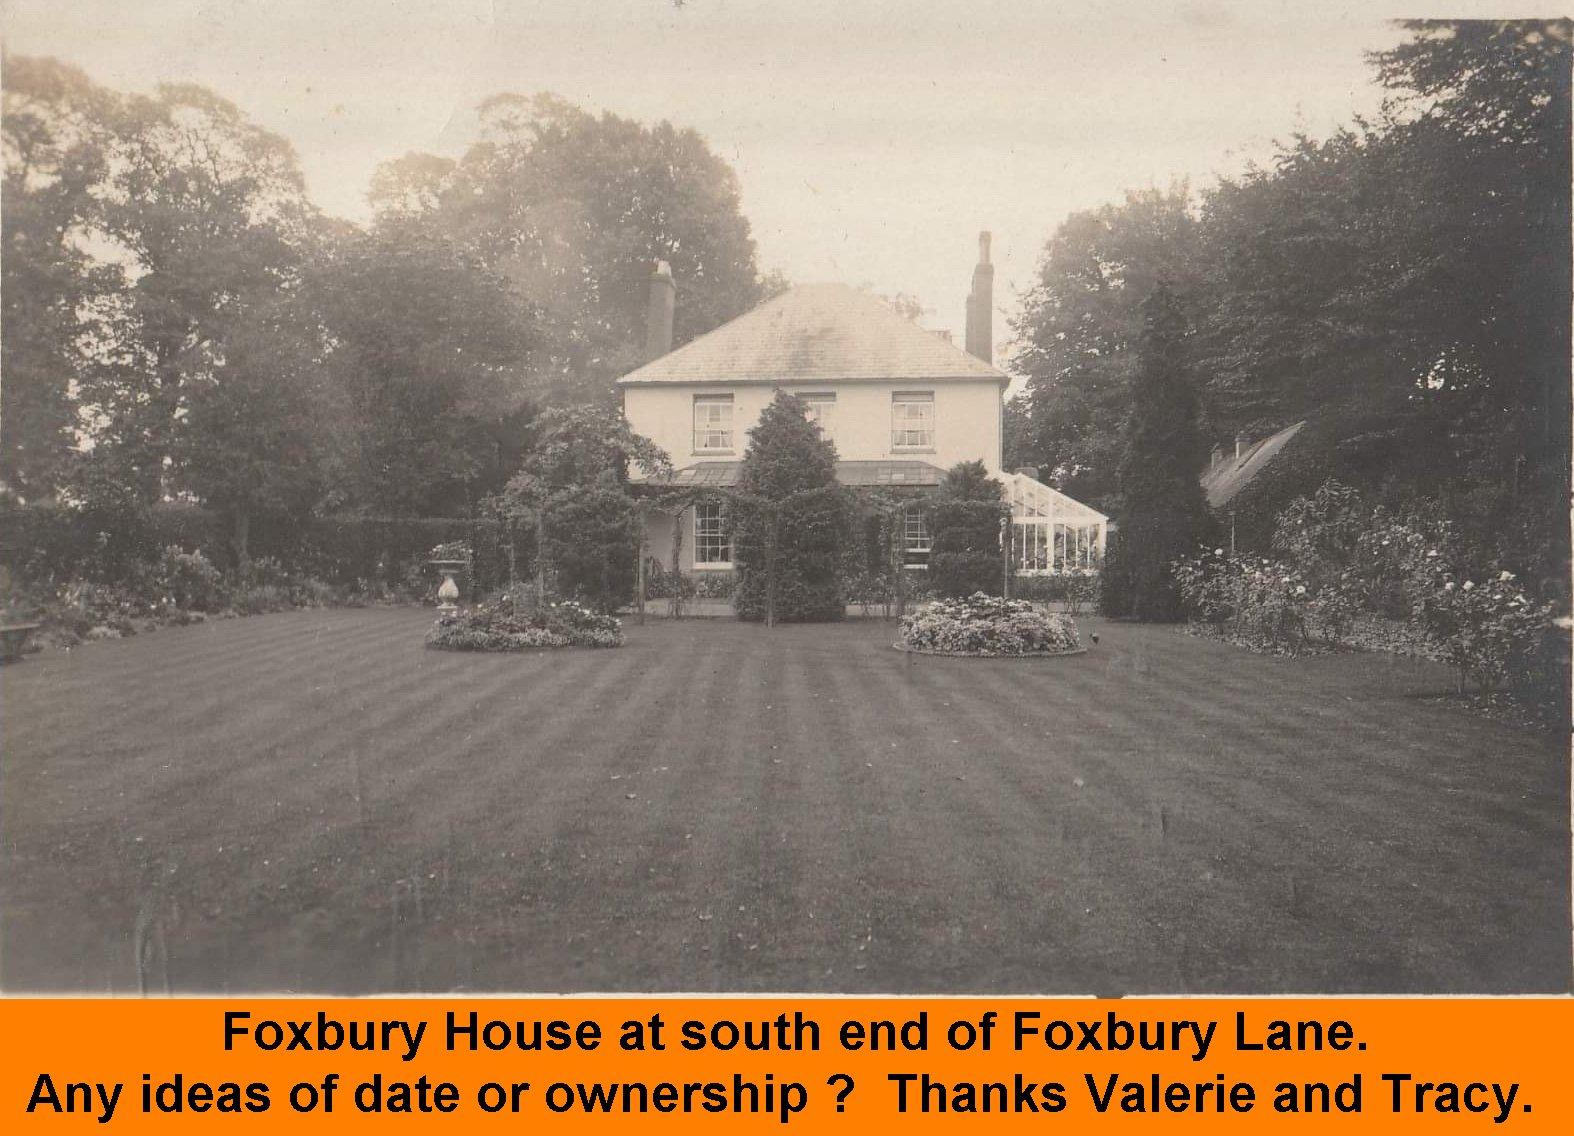 WESTBOURNE HISTORY PHOTO, FOXBURY HOUSE